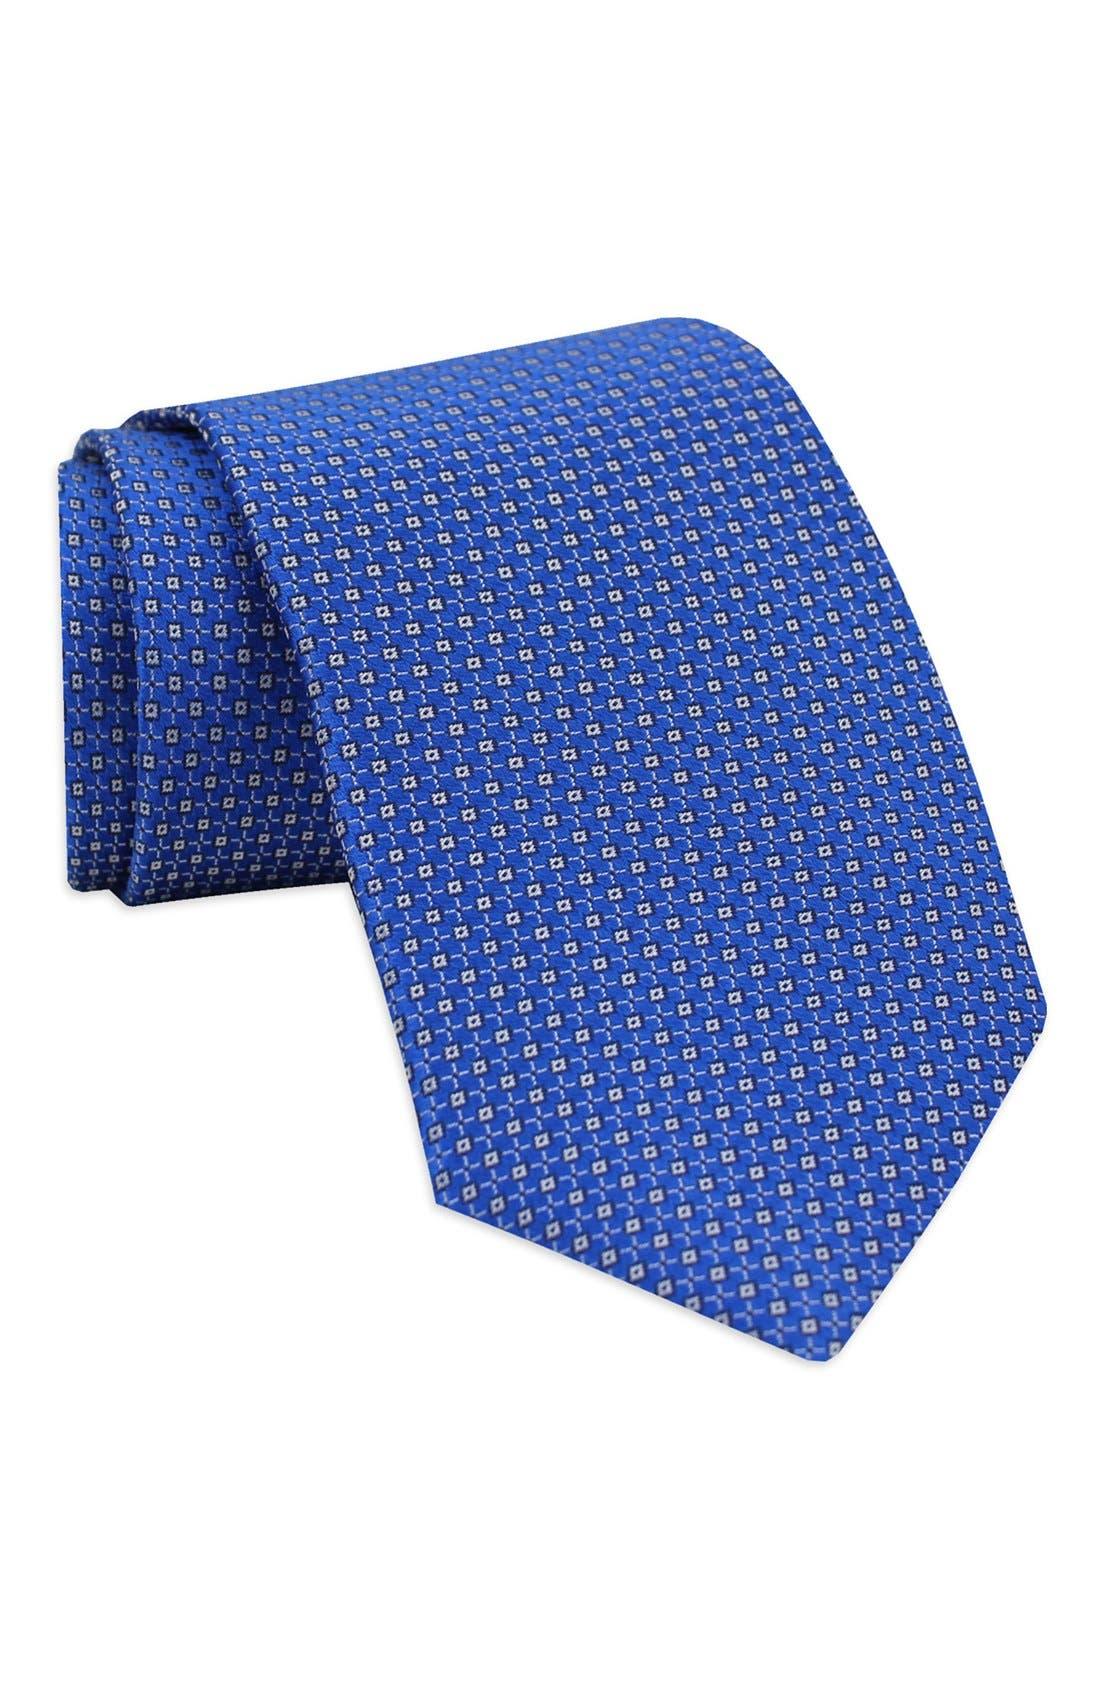 Alternate Image 1 Selected - Gitman Geometric Woven Silk Tie